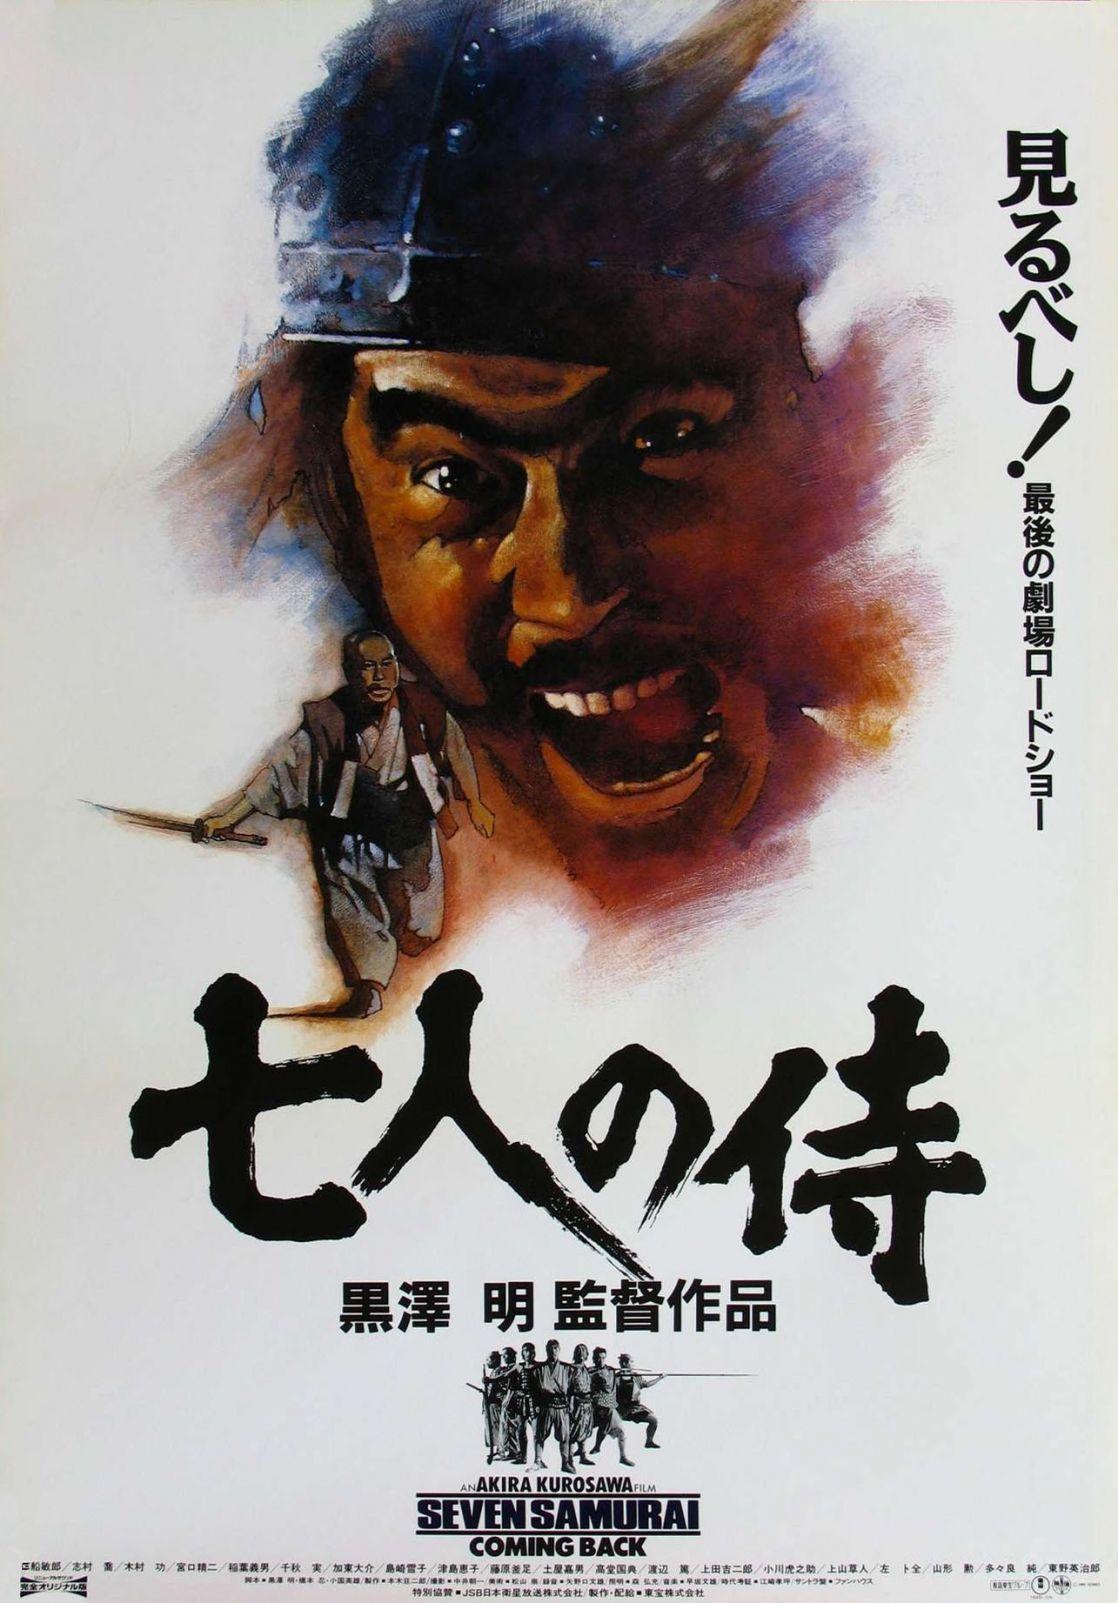 Samurai Movie Posters